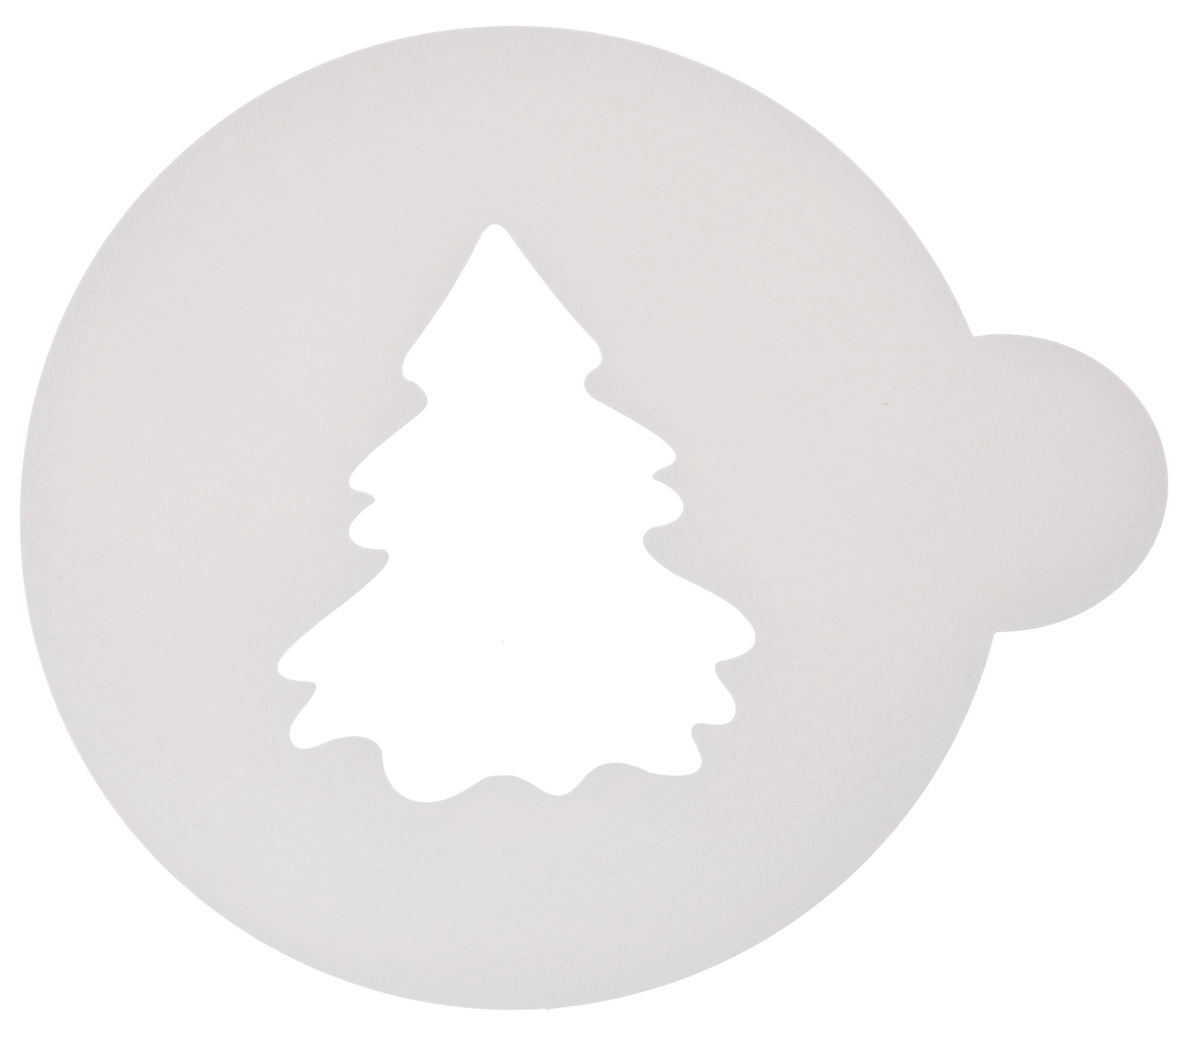 Трафарет на кофе и десерты Леденцовая фабрика Елочка, цвет: белый, диаметр 10 см трафарет на кофе и десерты леденцовая фабрика кошка с рыбой диаметр 10 см